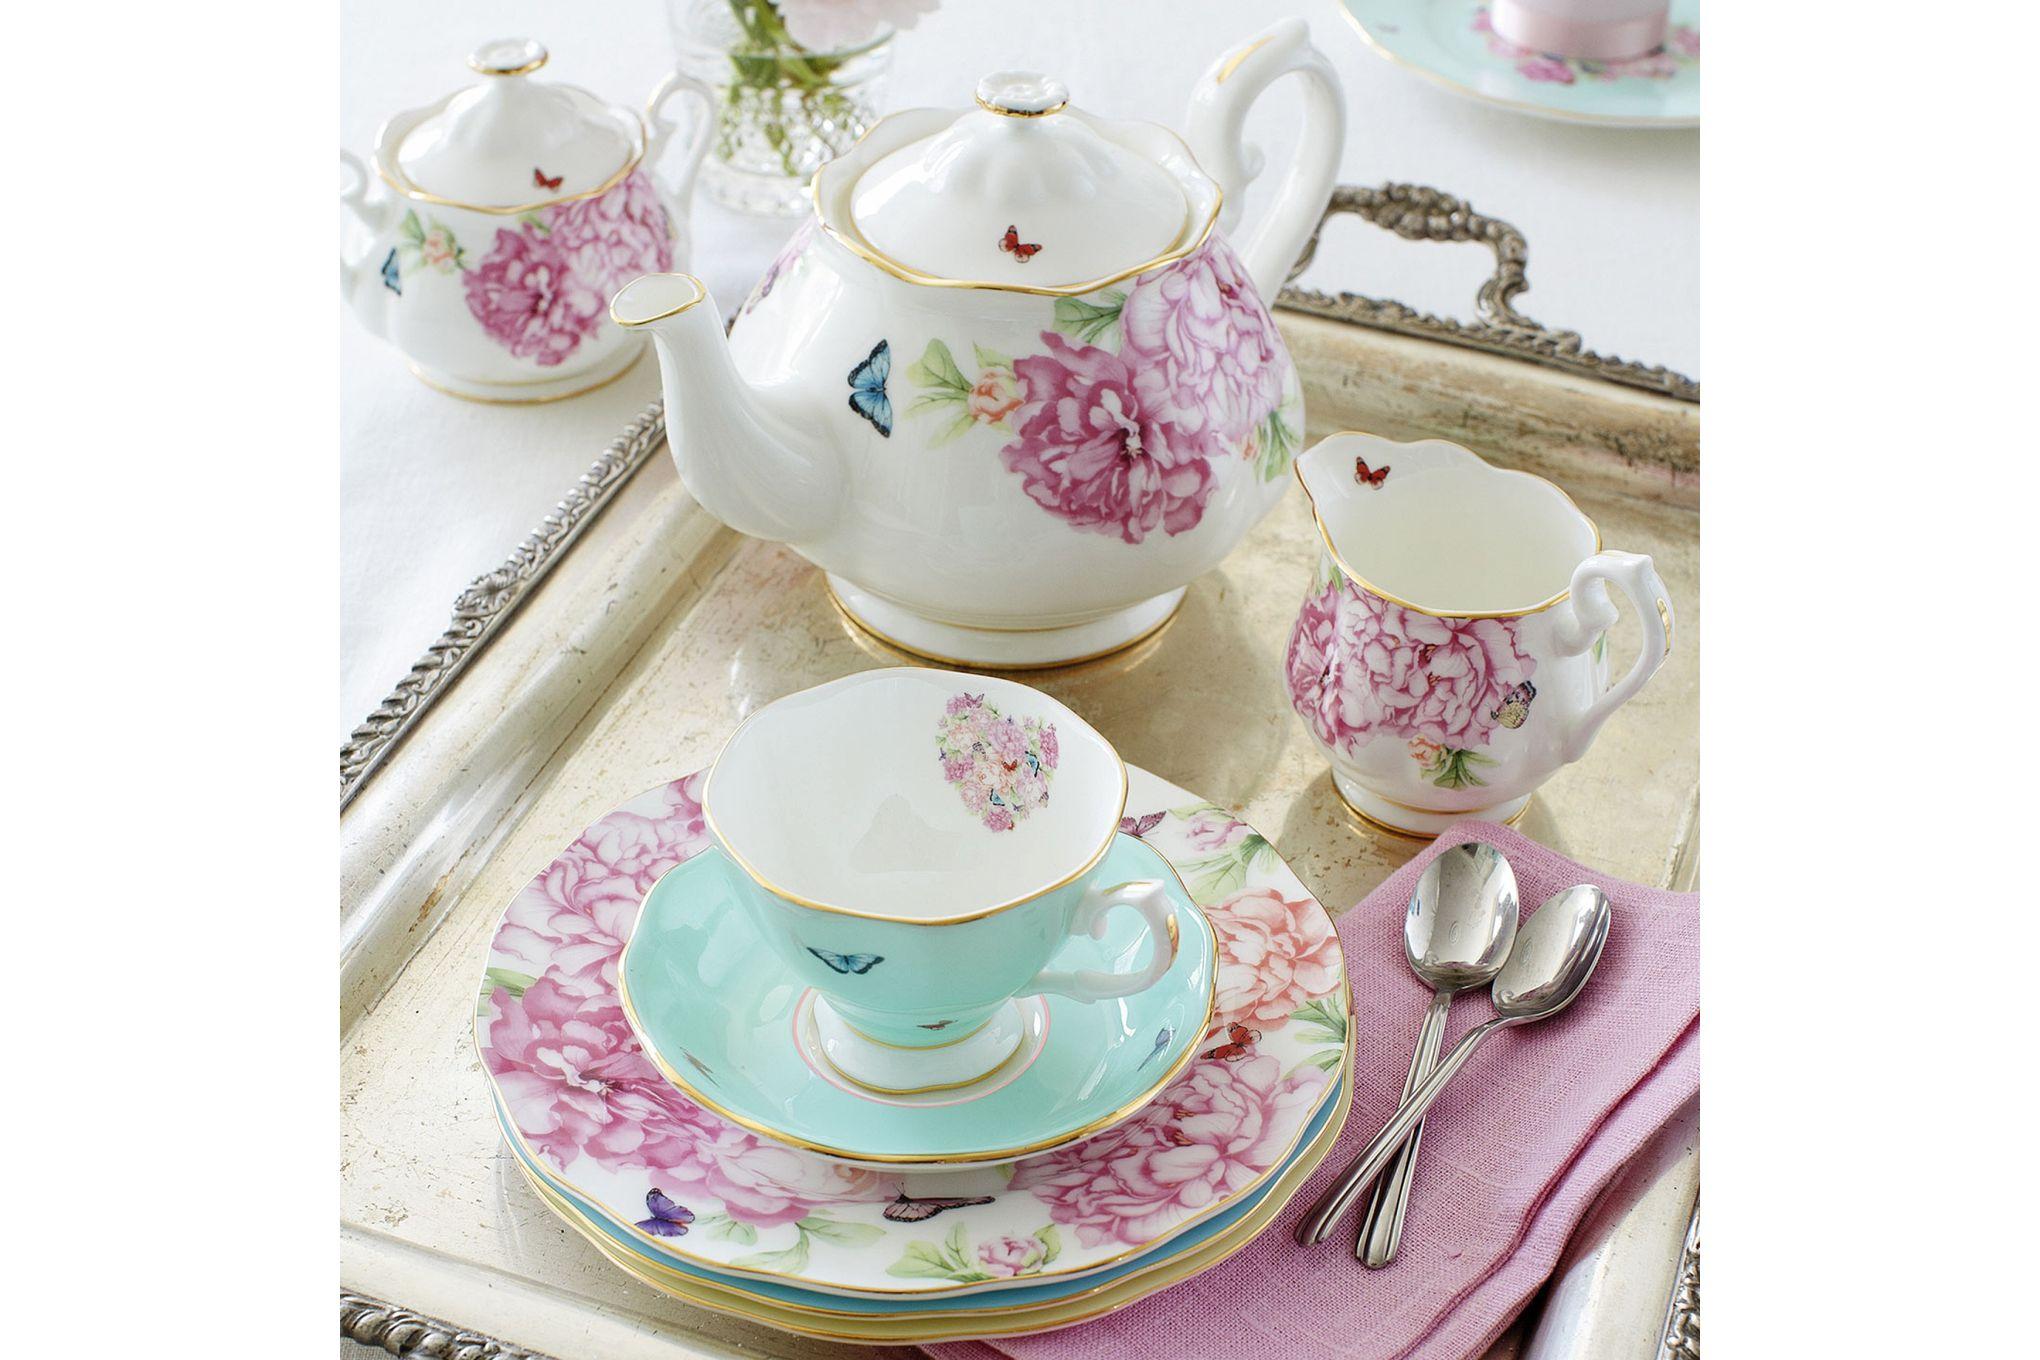 Miranda Kerr for Royal Albert Friendship Teapot 1.25l thumb 3